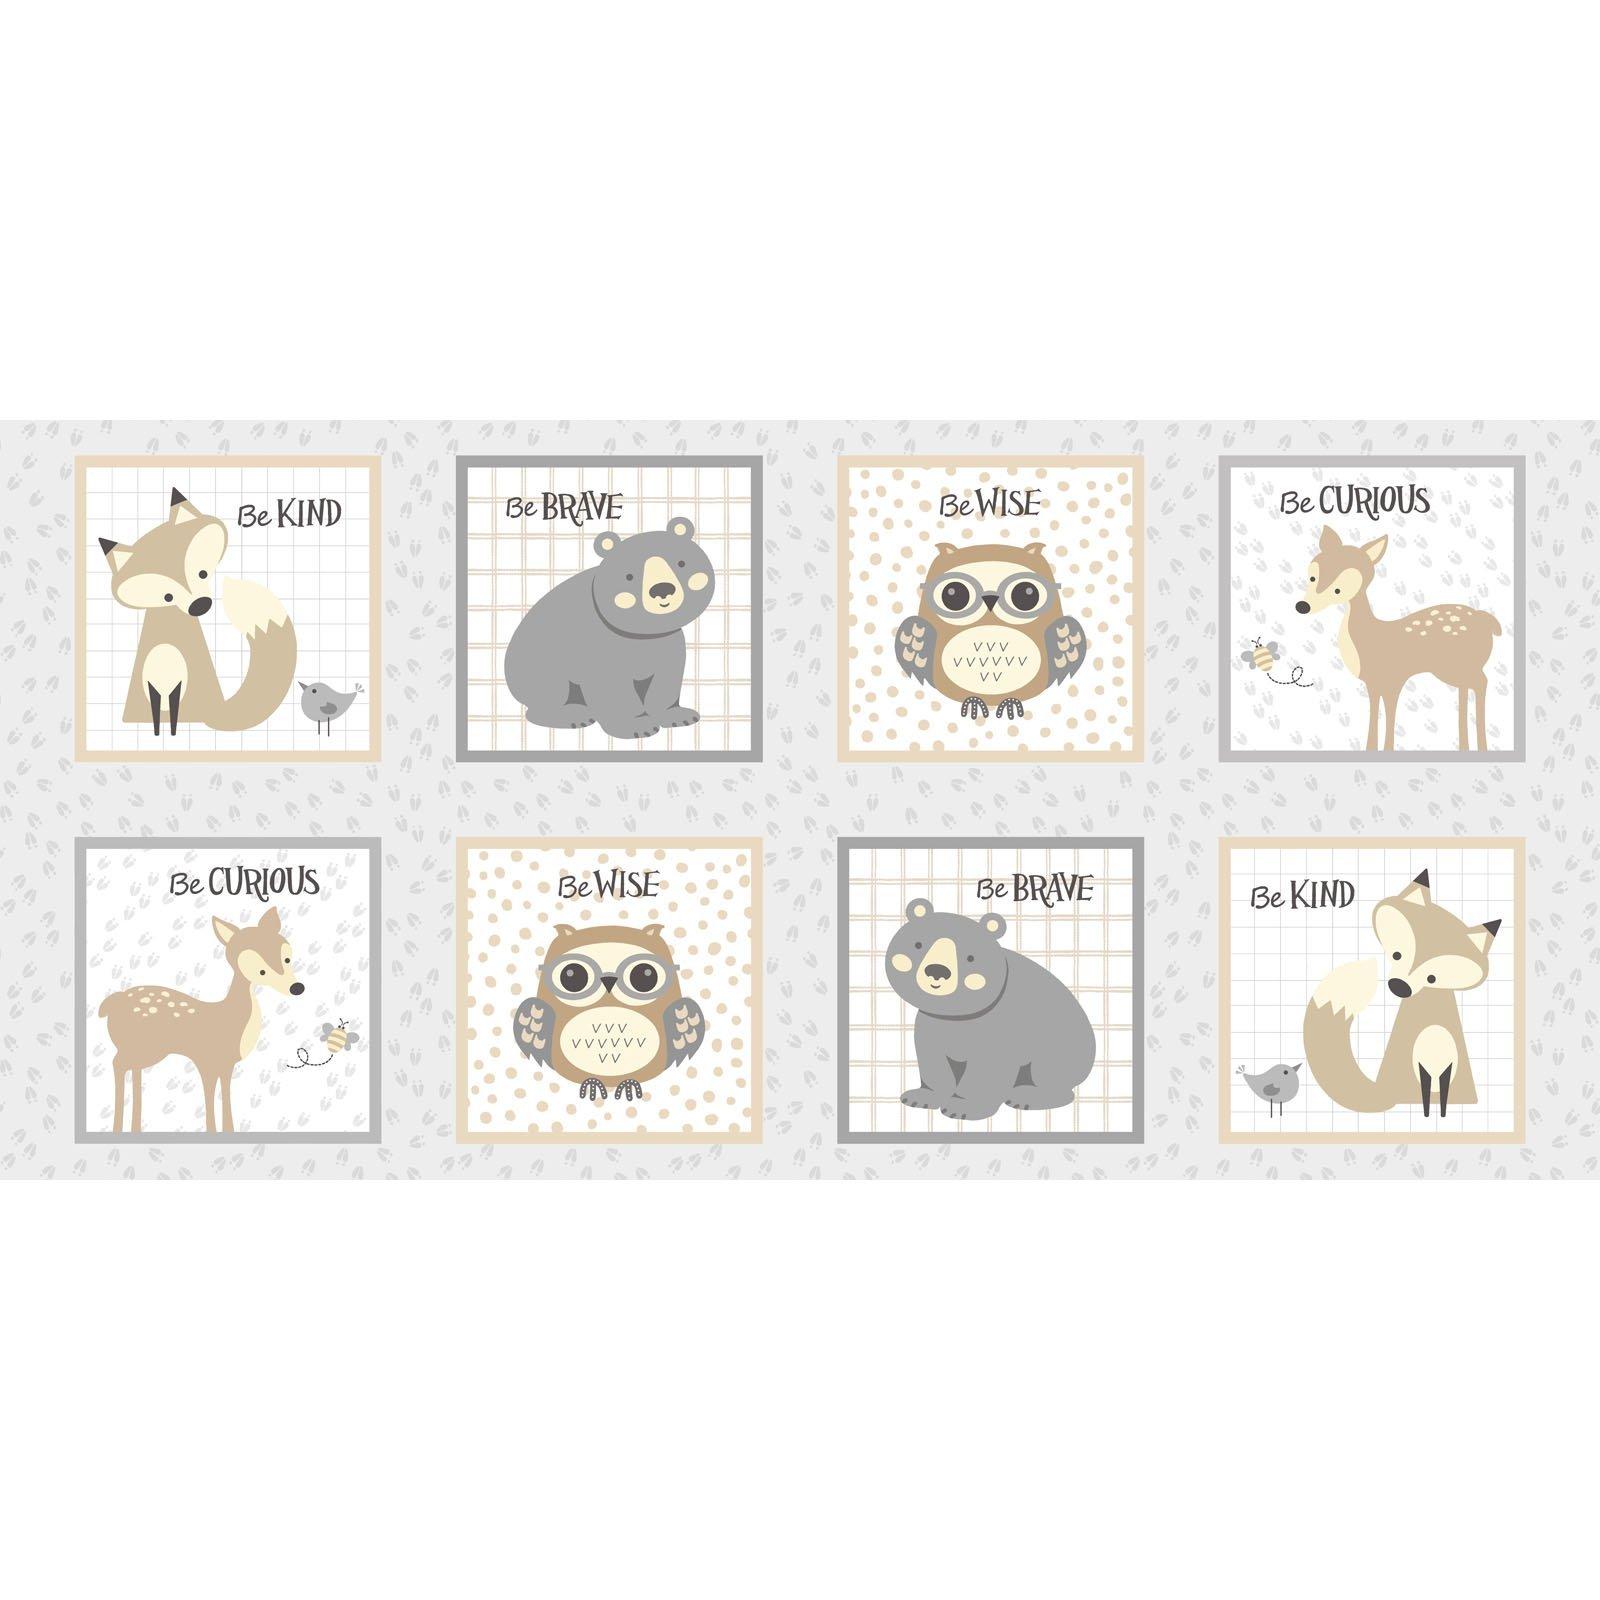 LITC-4293 MU - LITTLE CRITTERS BY ROBIN RODERICK SQUARE ANIMALS MULTI